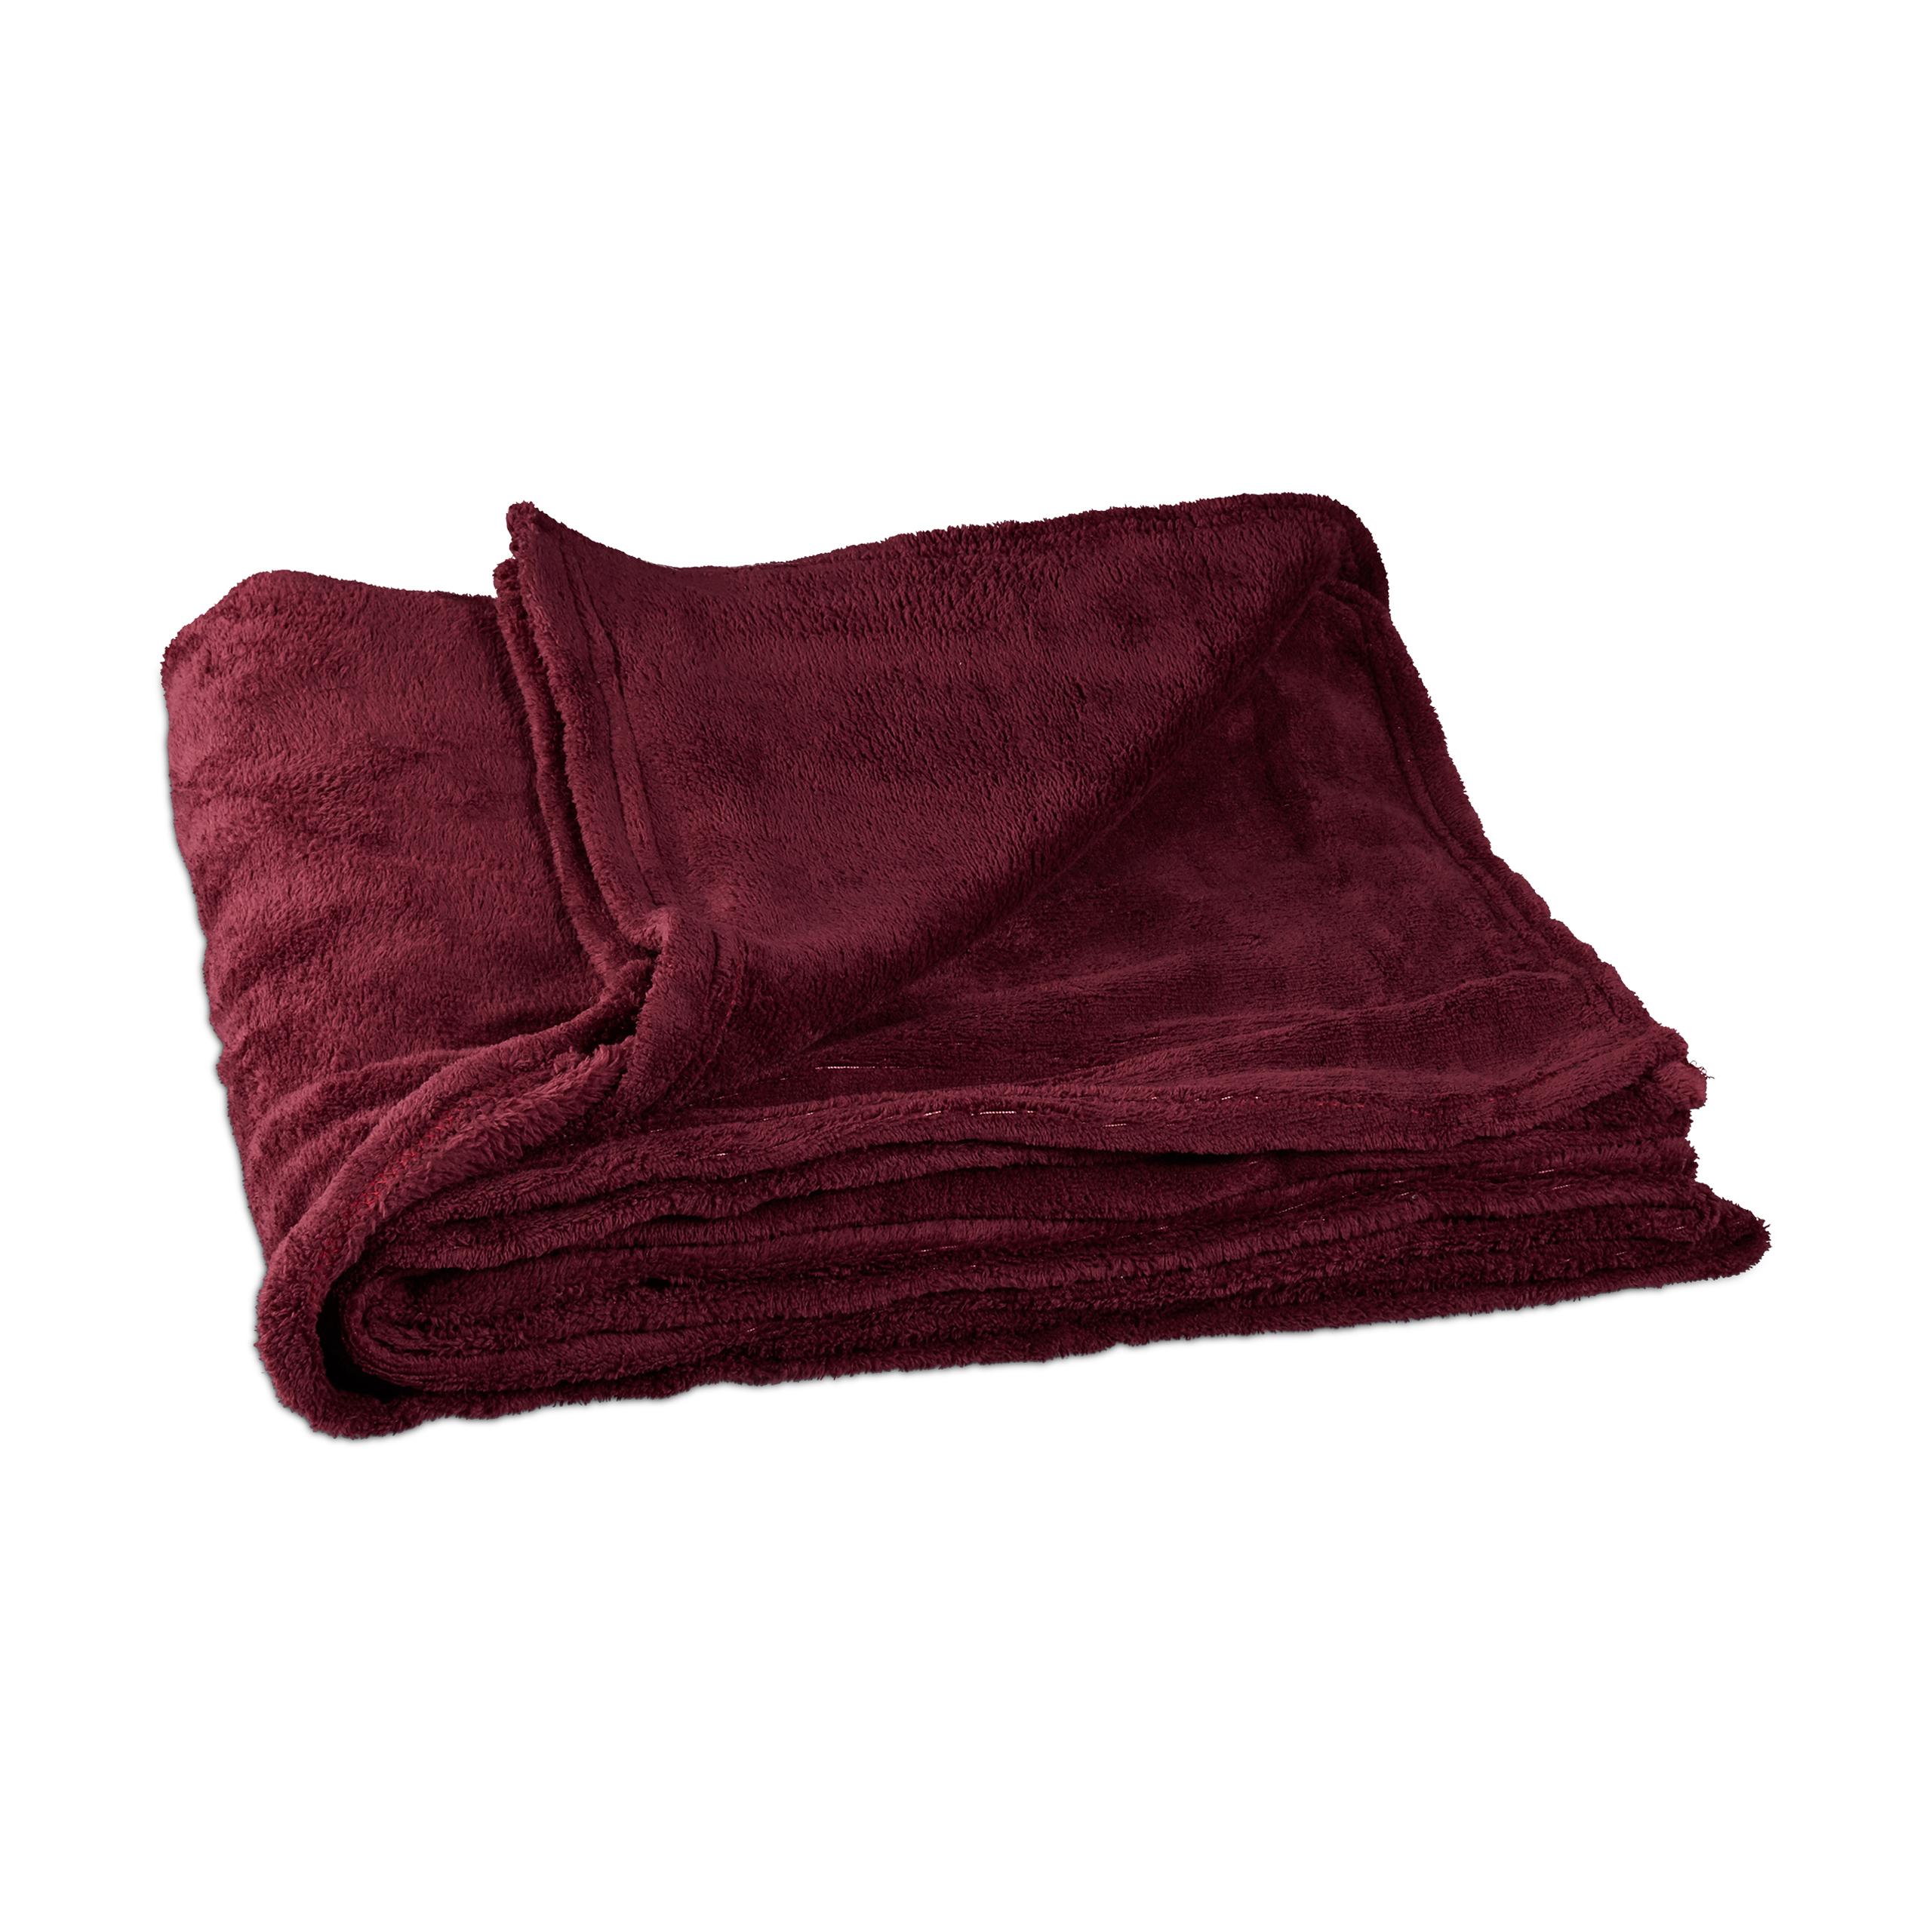 Kuscheldecke-gross-einfarbig-trocknergeeignet-Sofa-Couch-Tagesdecke-Fleece-Decke